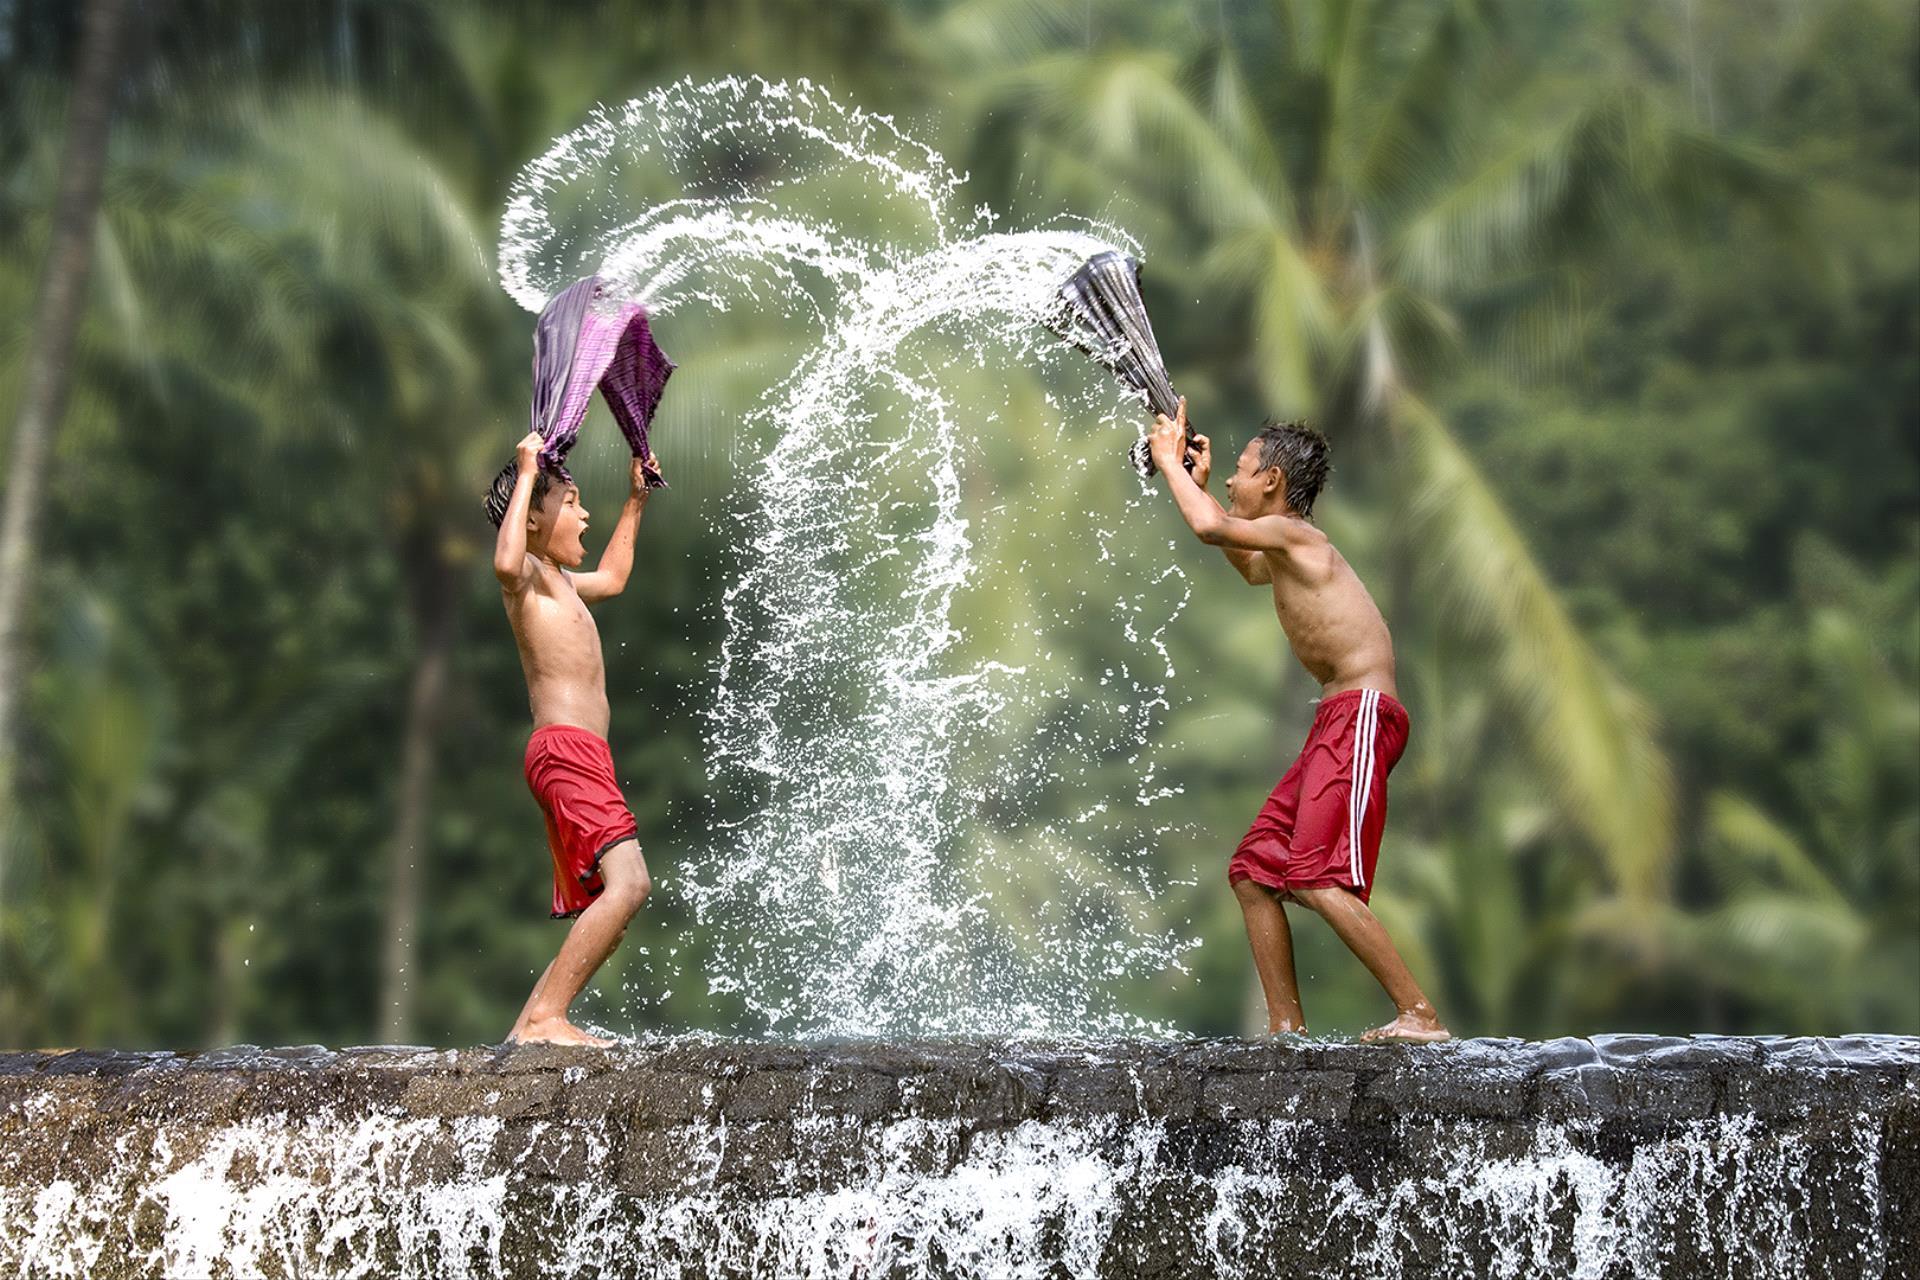 PhotoVivo Honor Mention - Kristanto Lie (Indonesia)  Splash